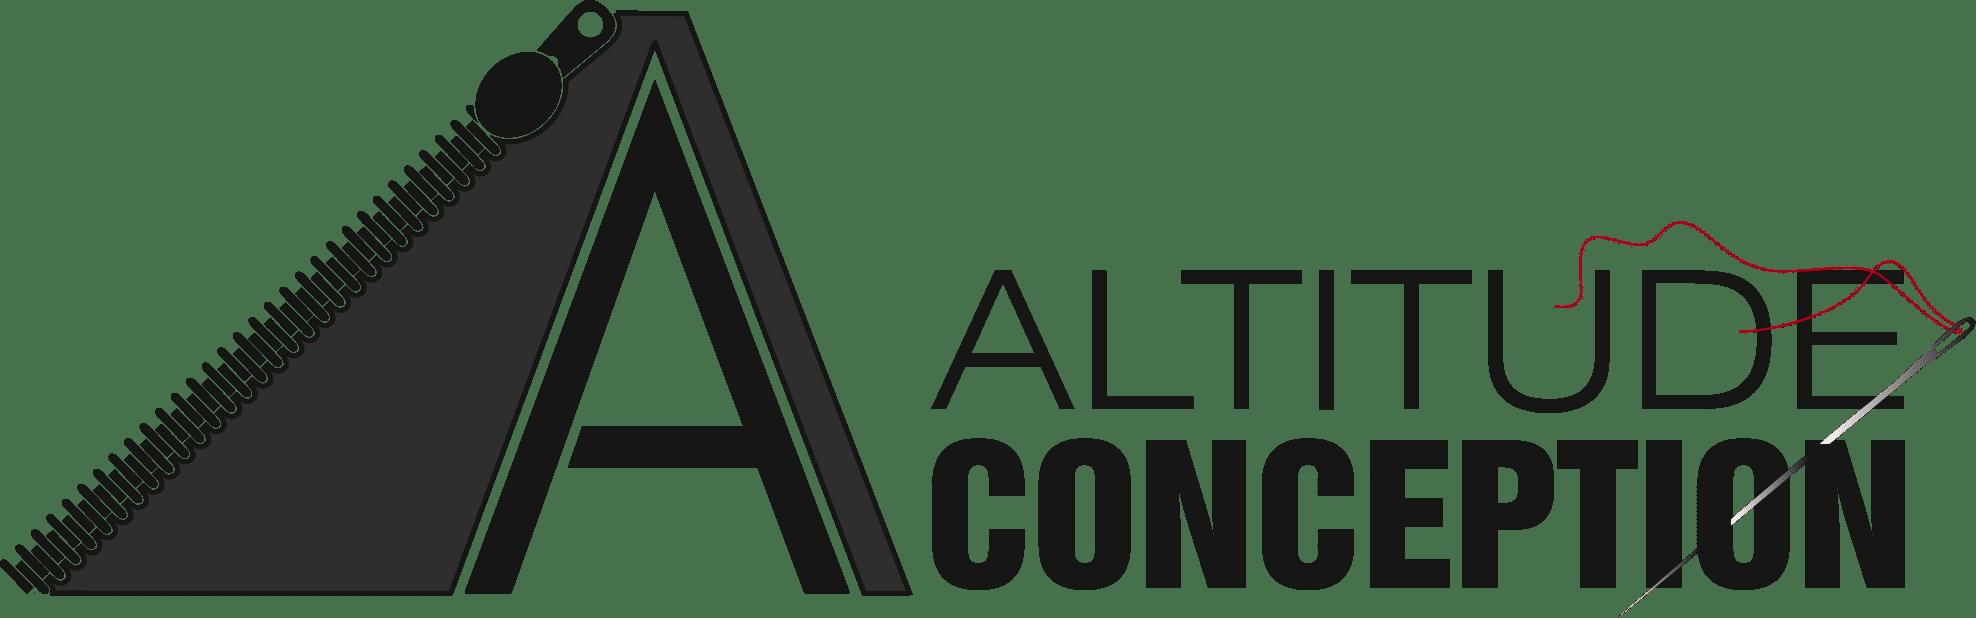 Altitude Conception